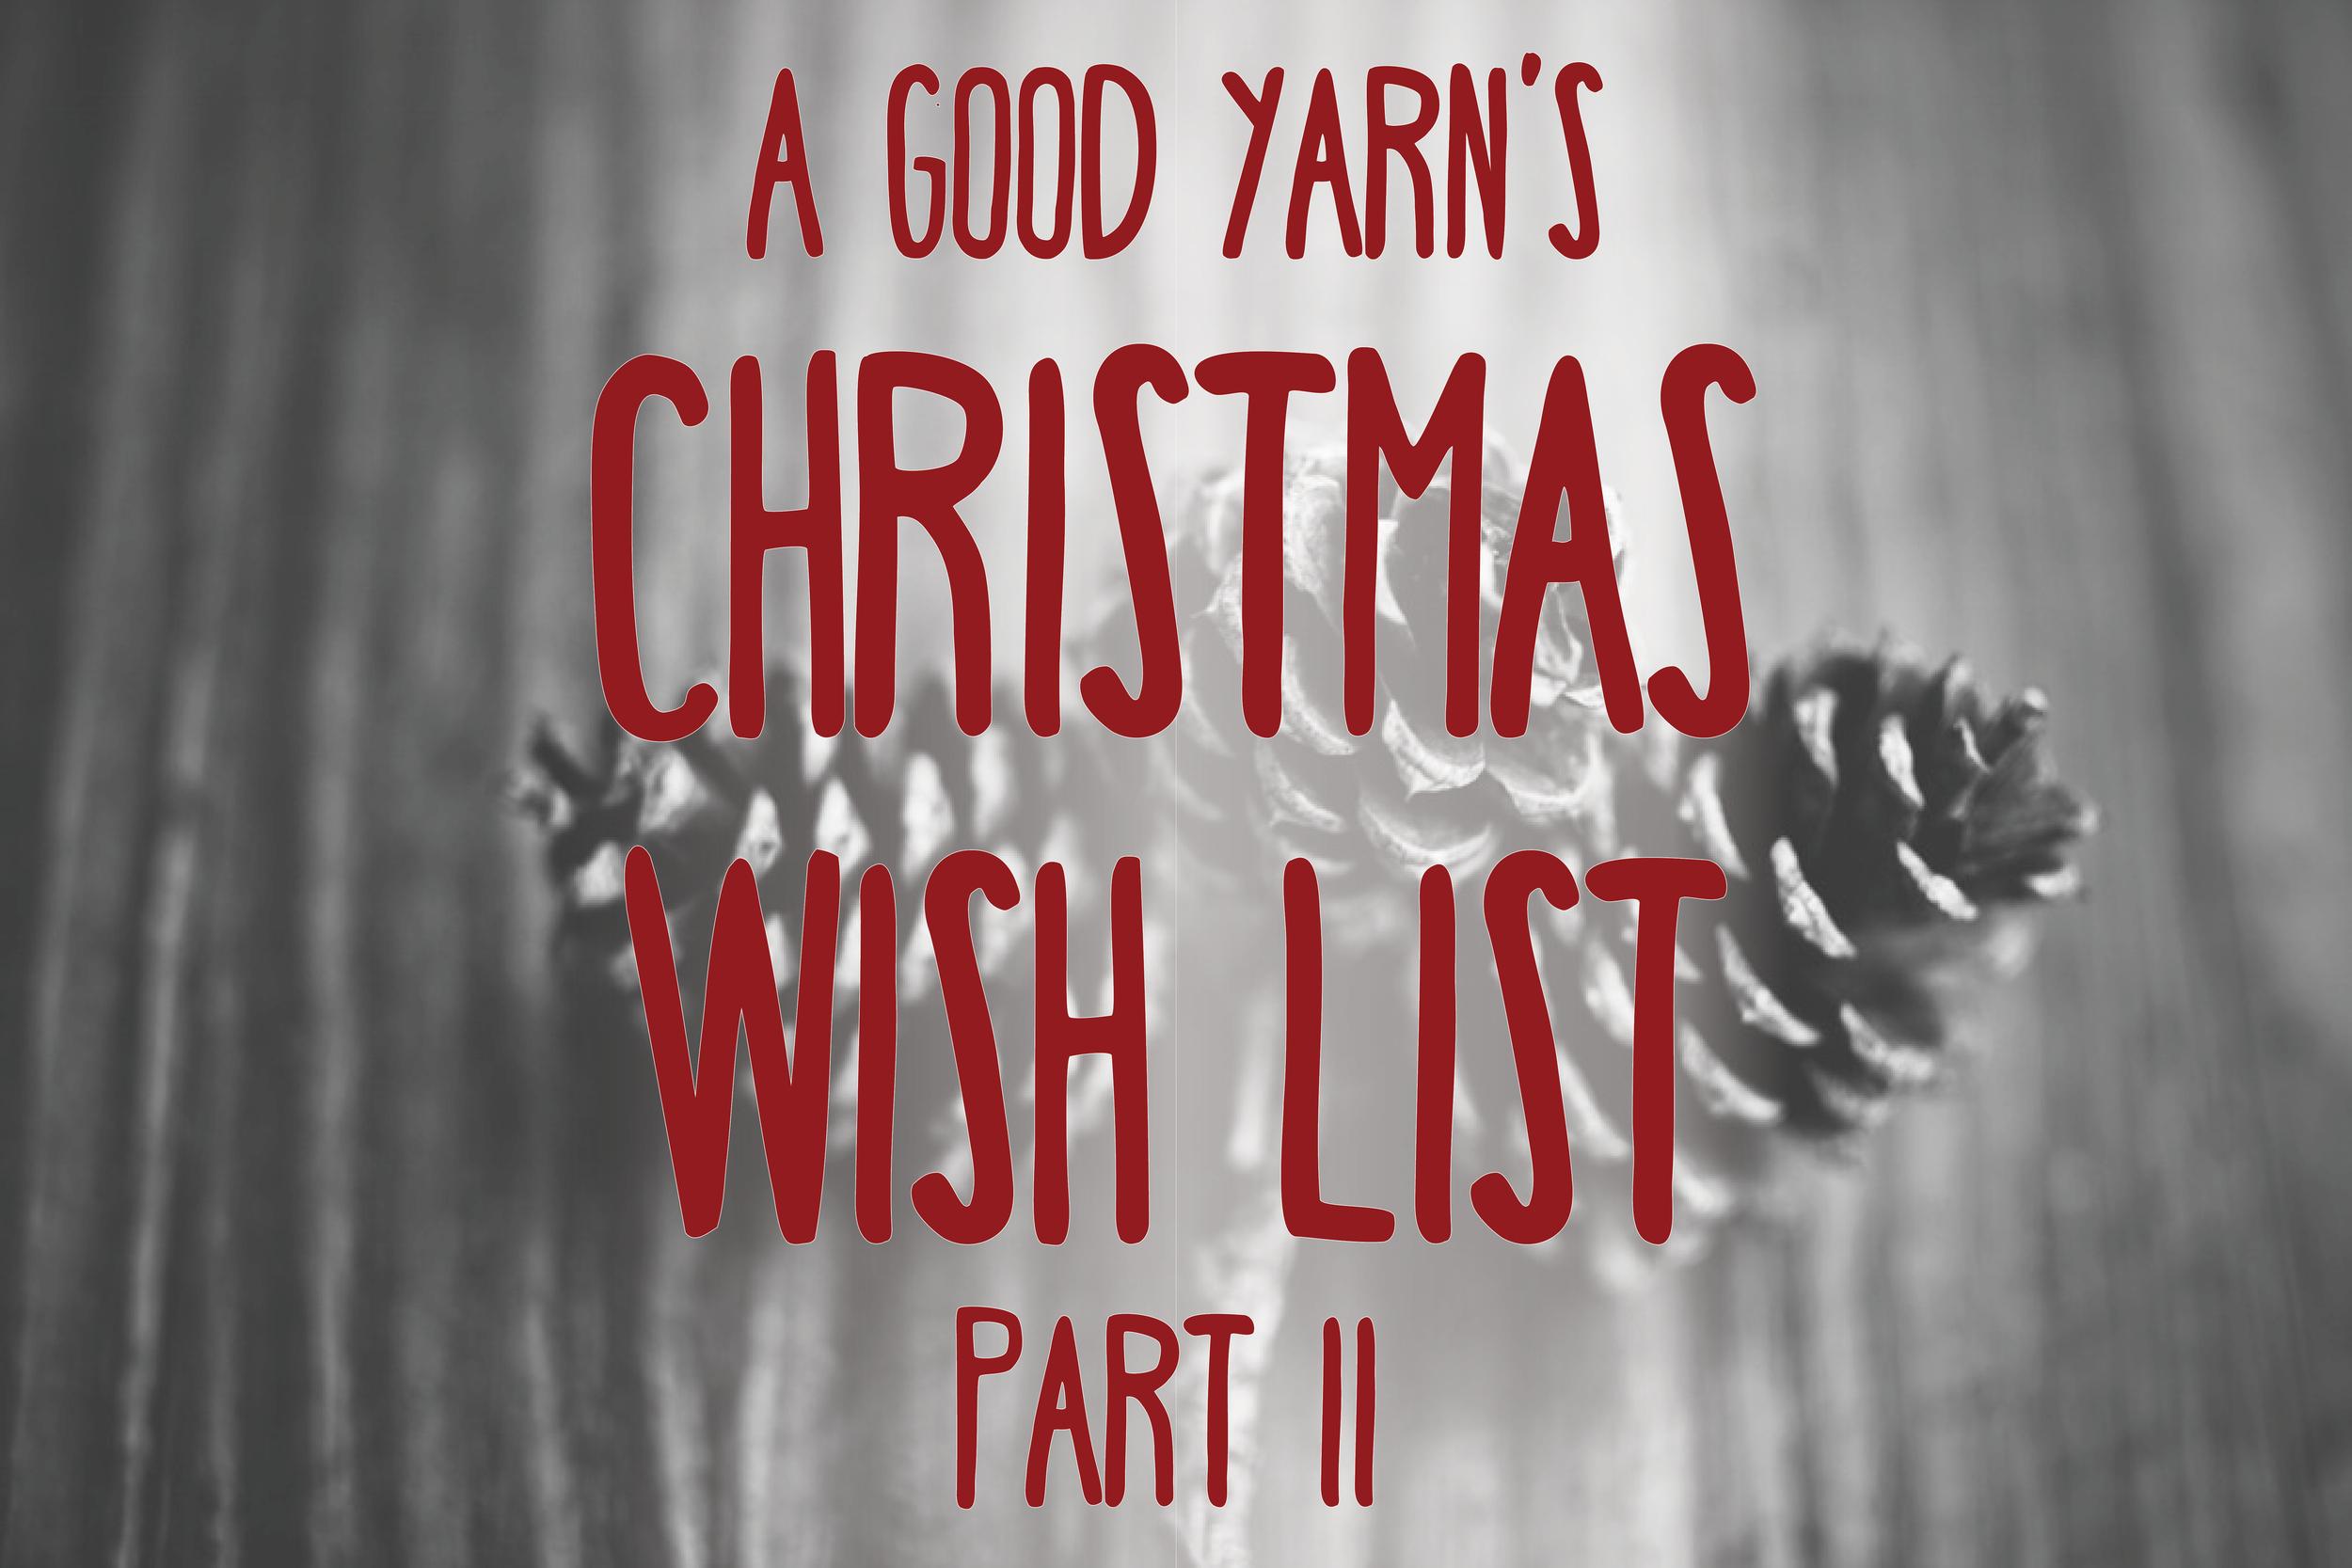 christmaswishlist_p2.jpg